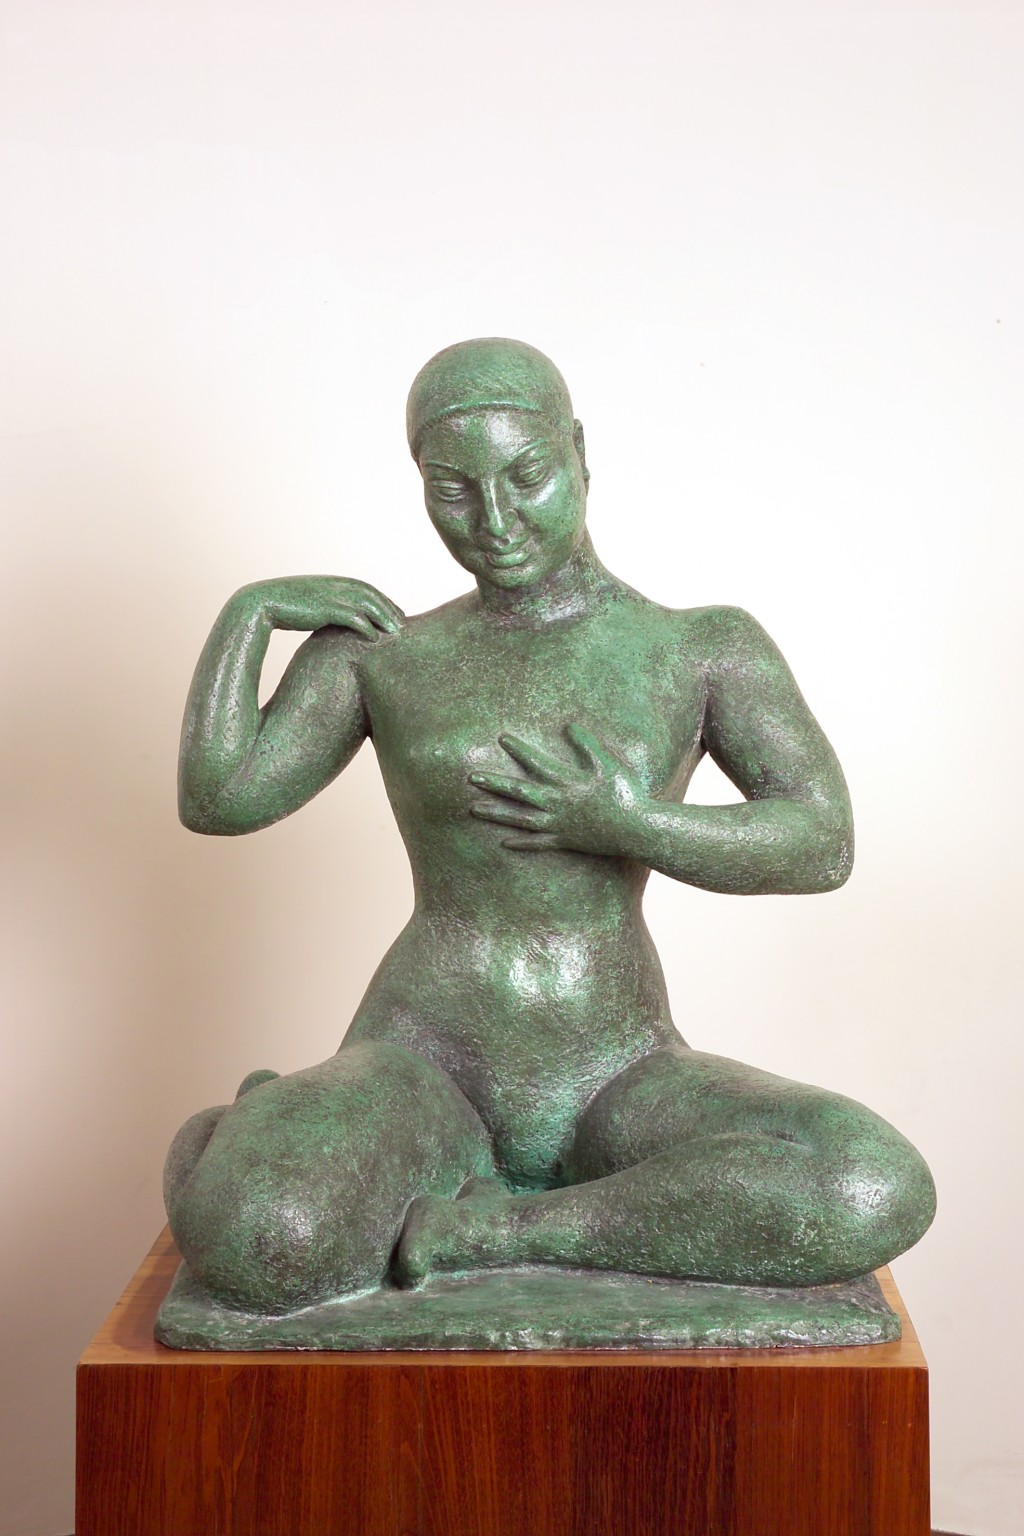 Dora Gordine, Pagan/Femina, bronze, 1930-2